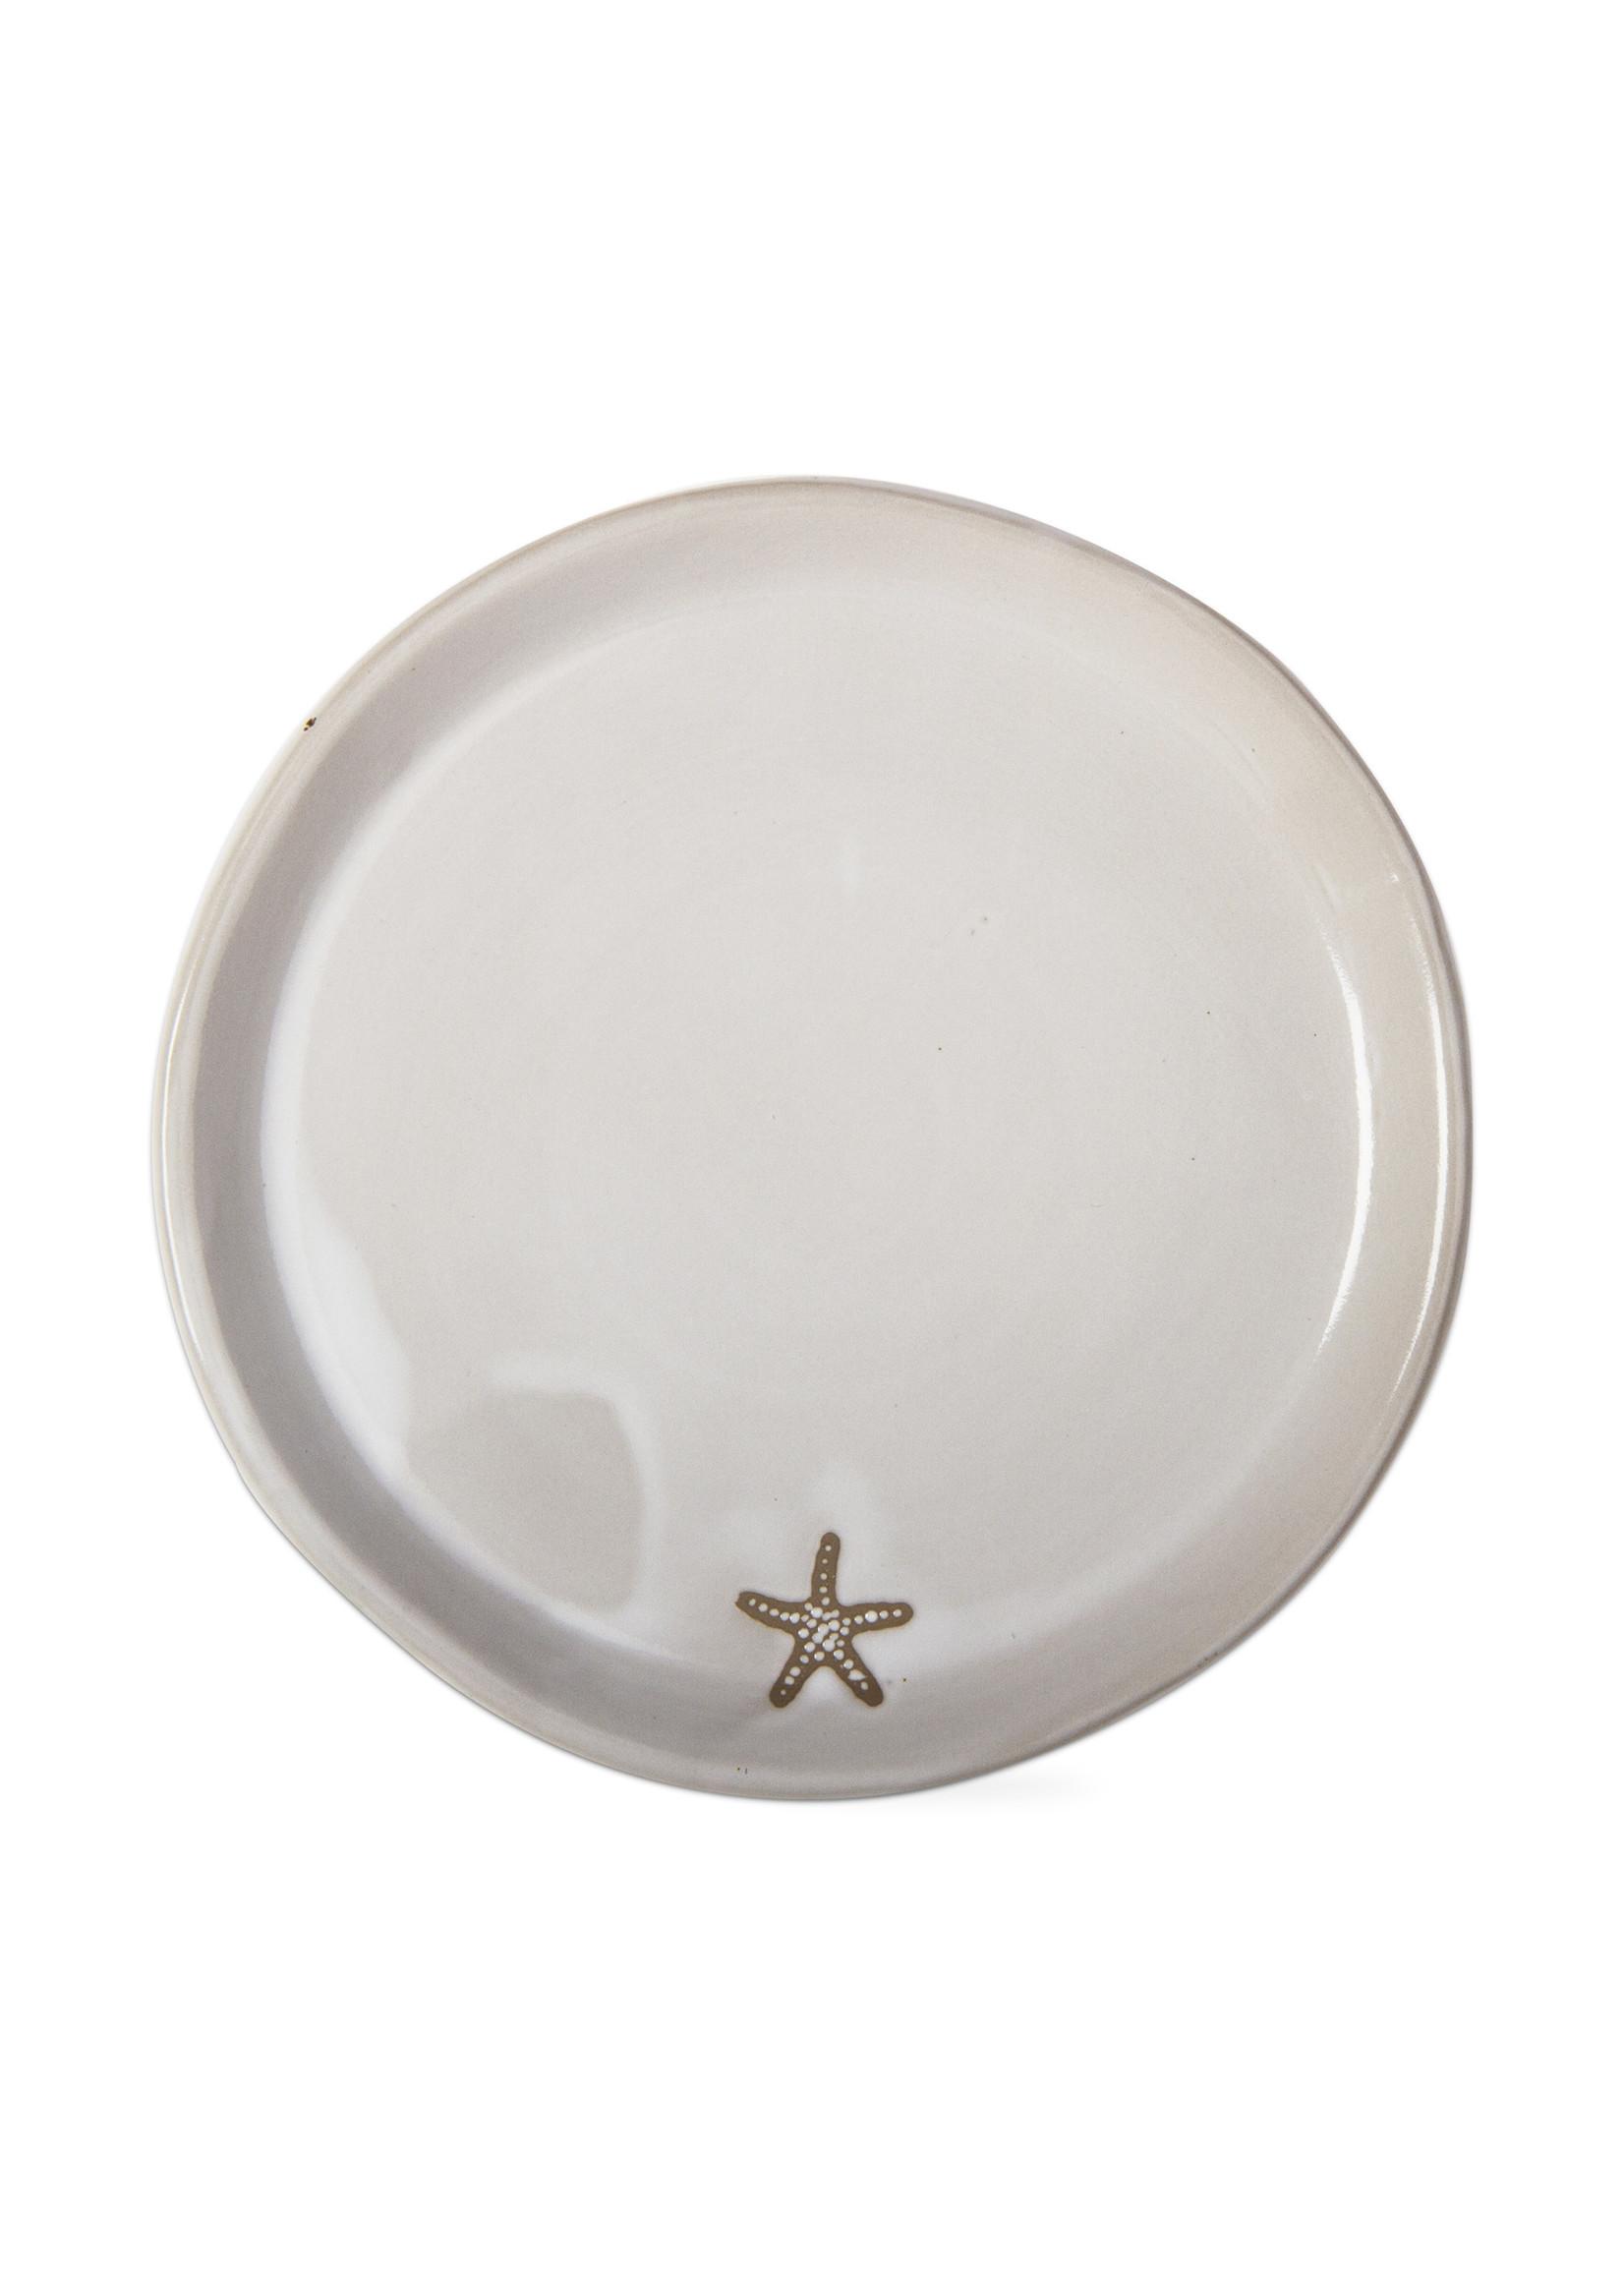 Tag Seashore Seastar Appetizer Plate-White